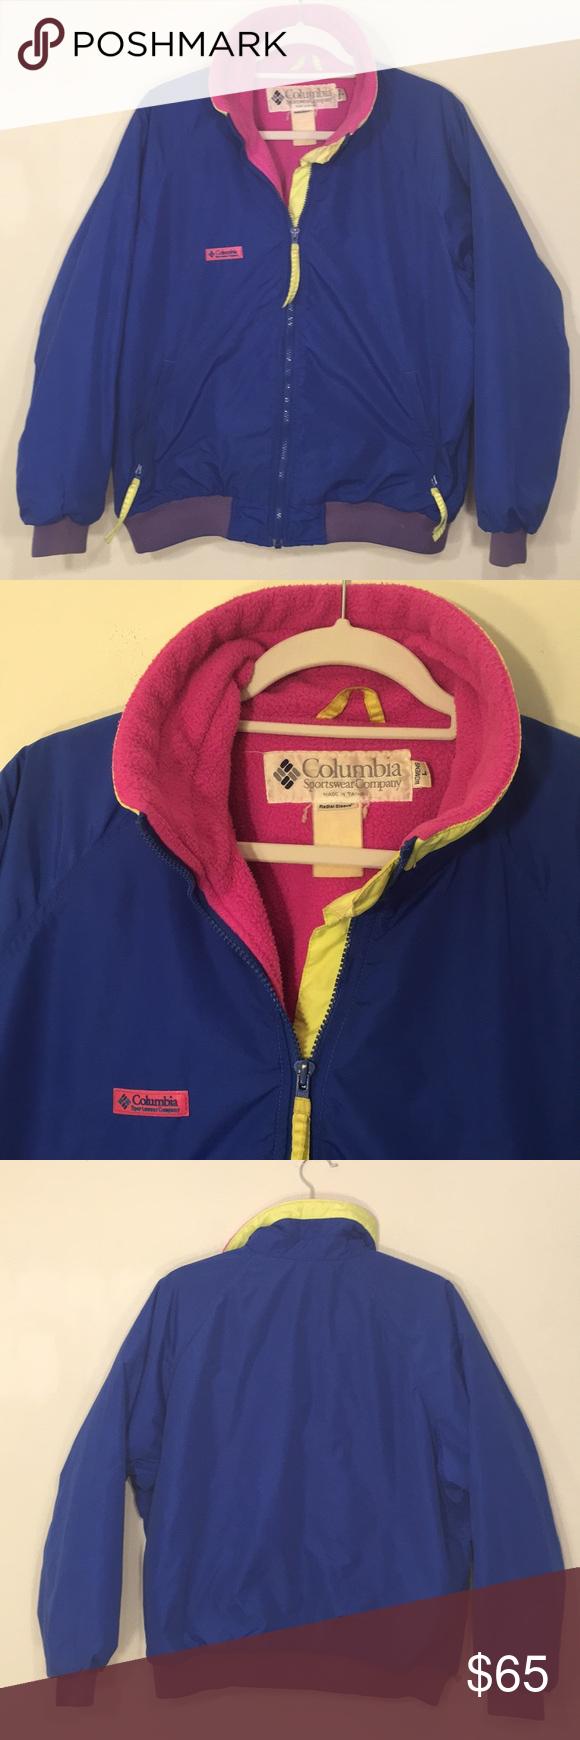 Vintage us columbia neon ski snow jacket l my posh picks